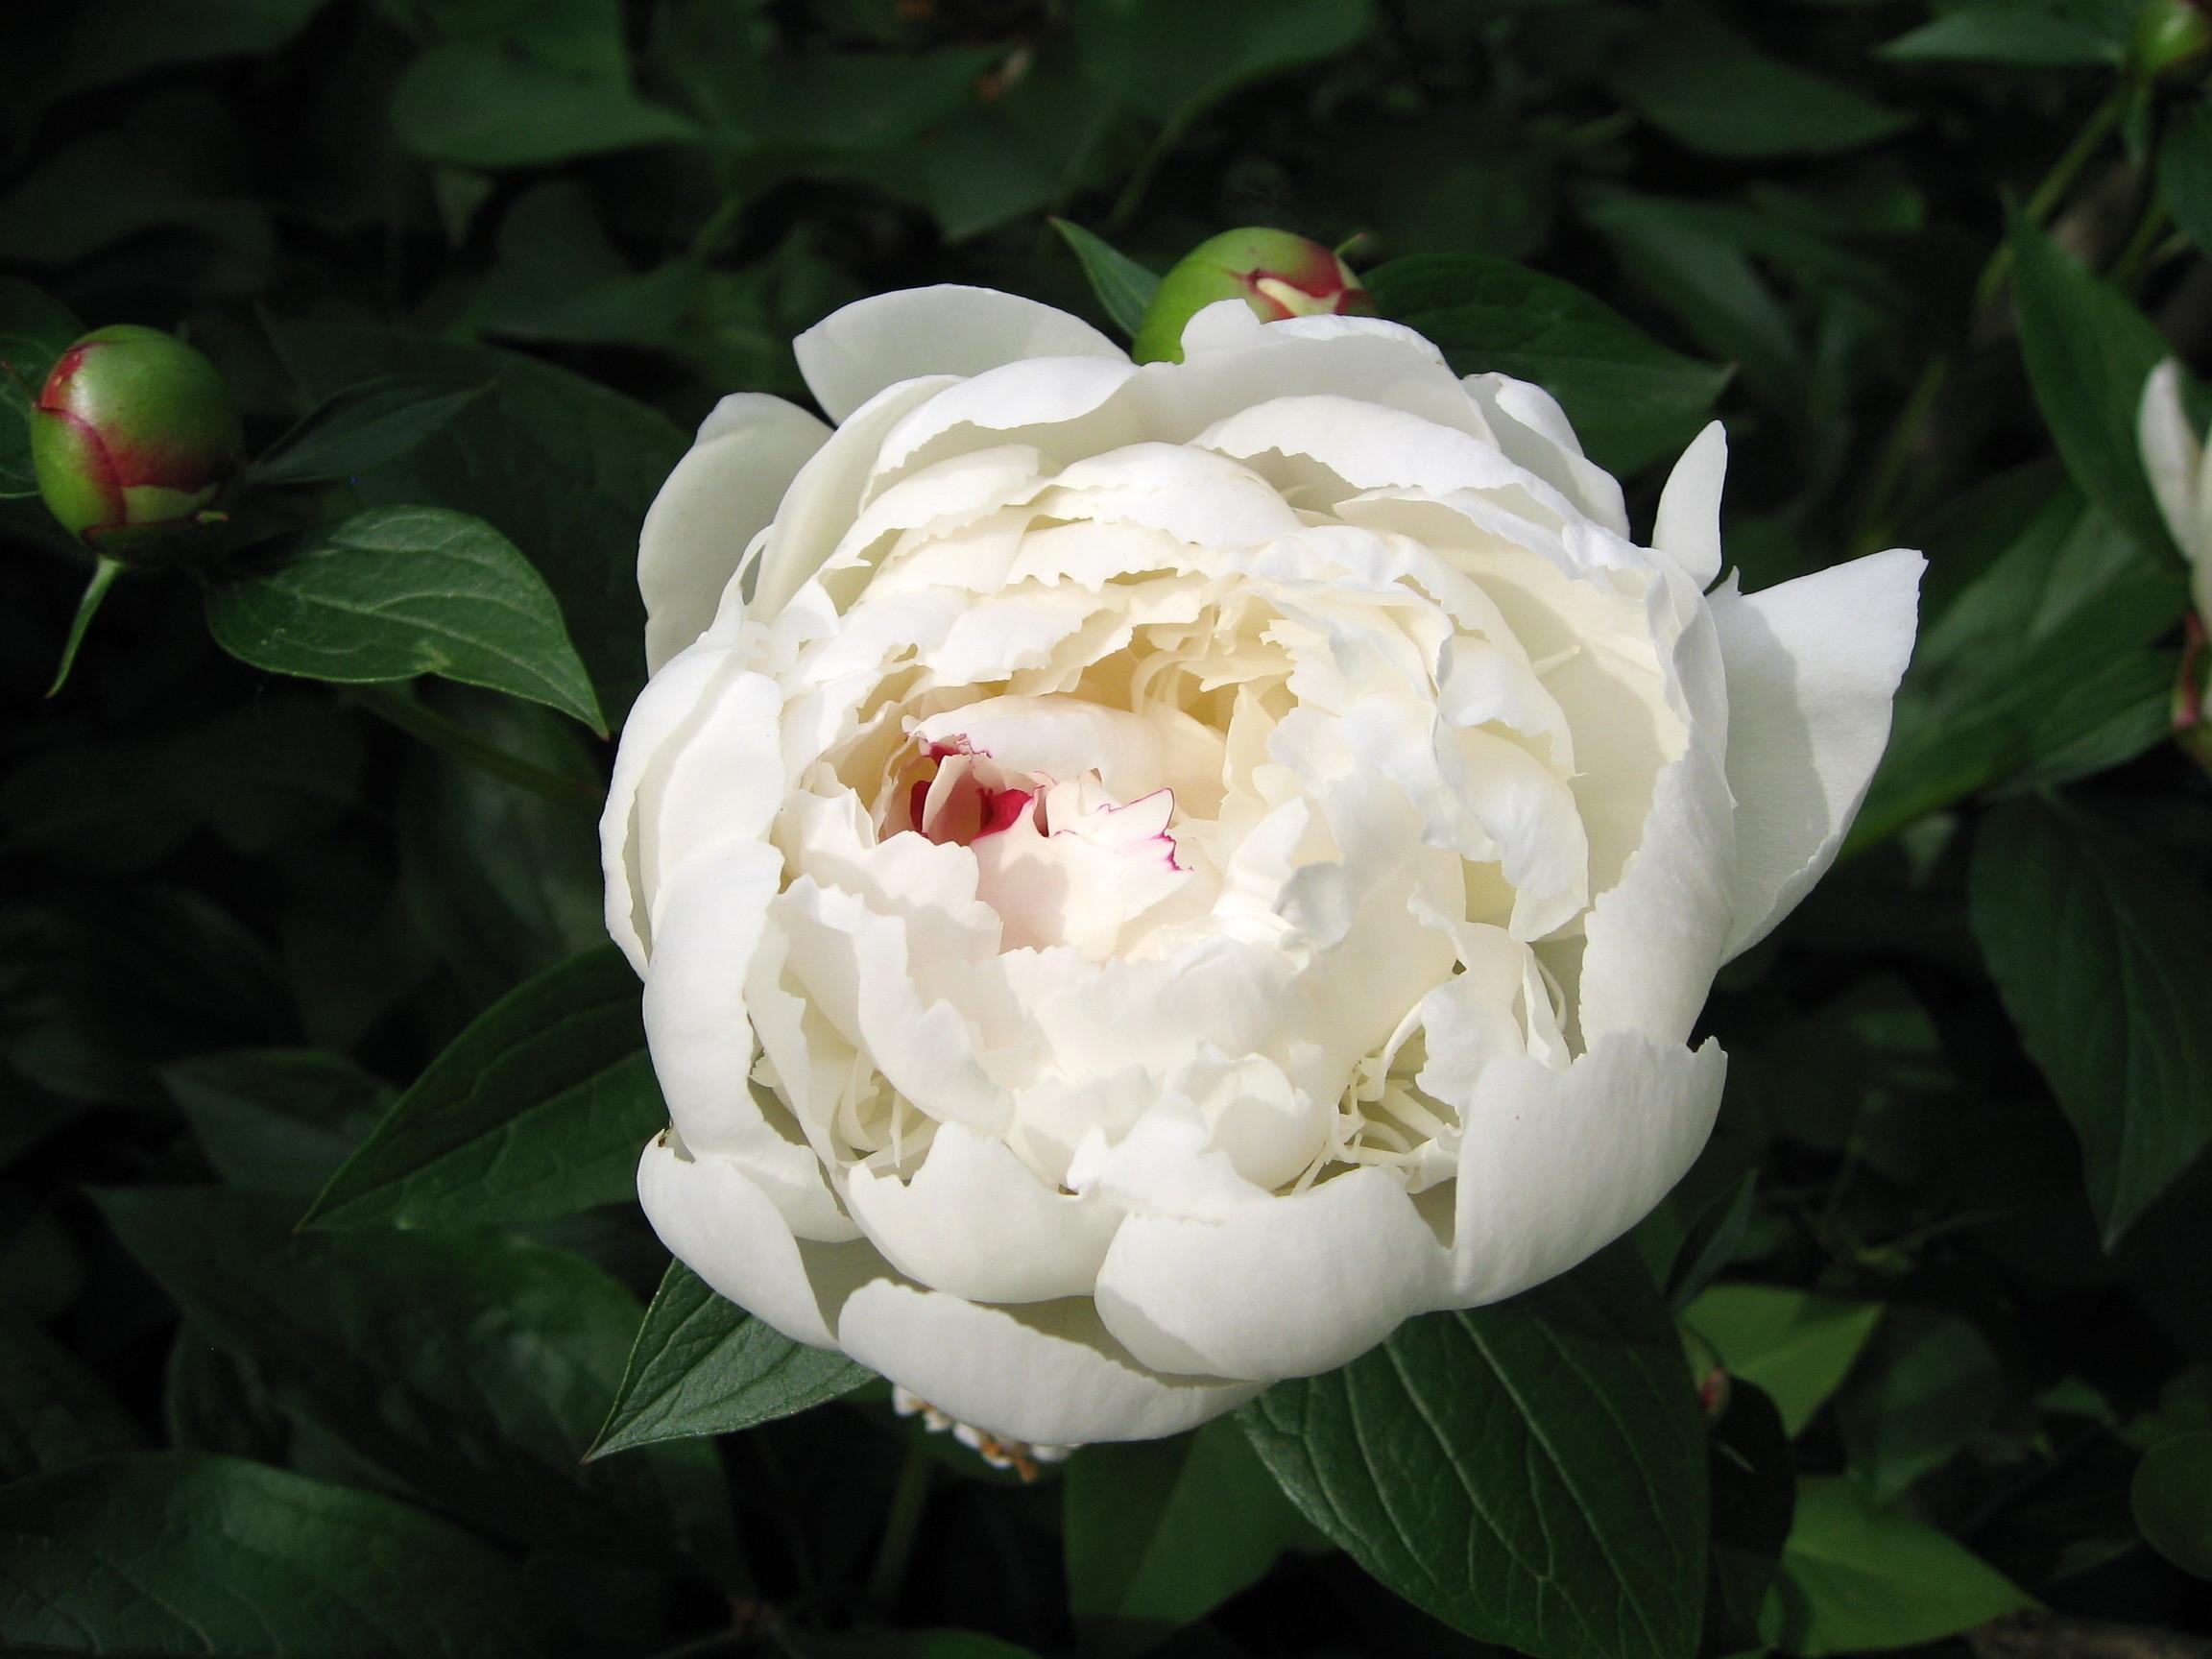 Res: 2304x1728, Beautiful white peony